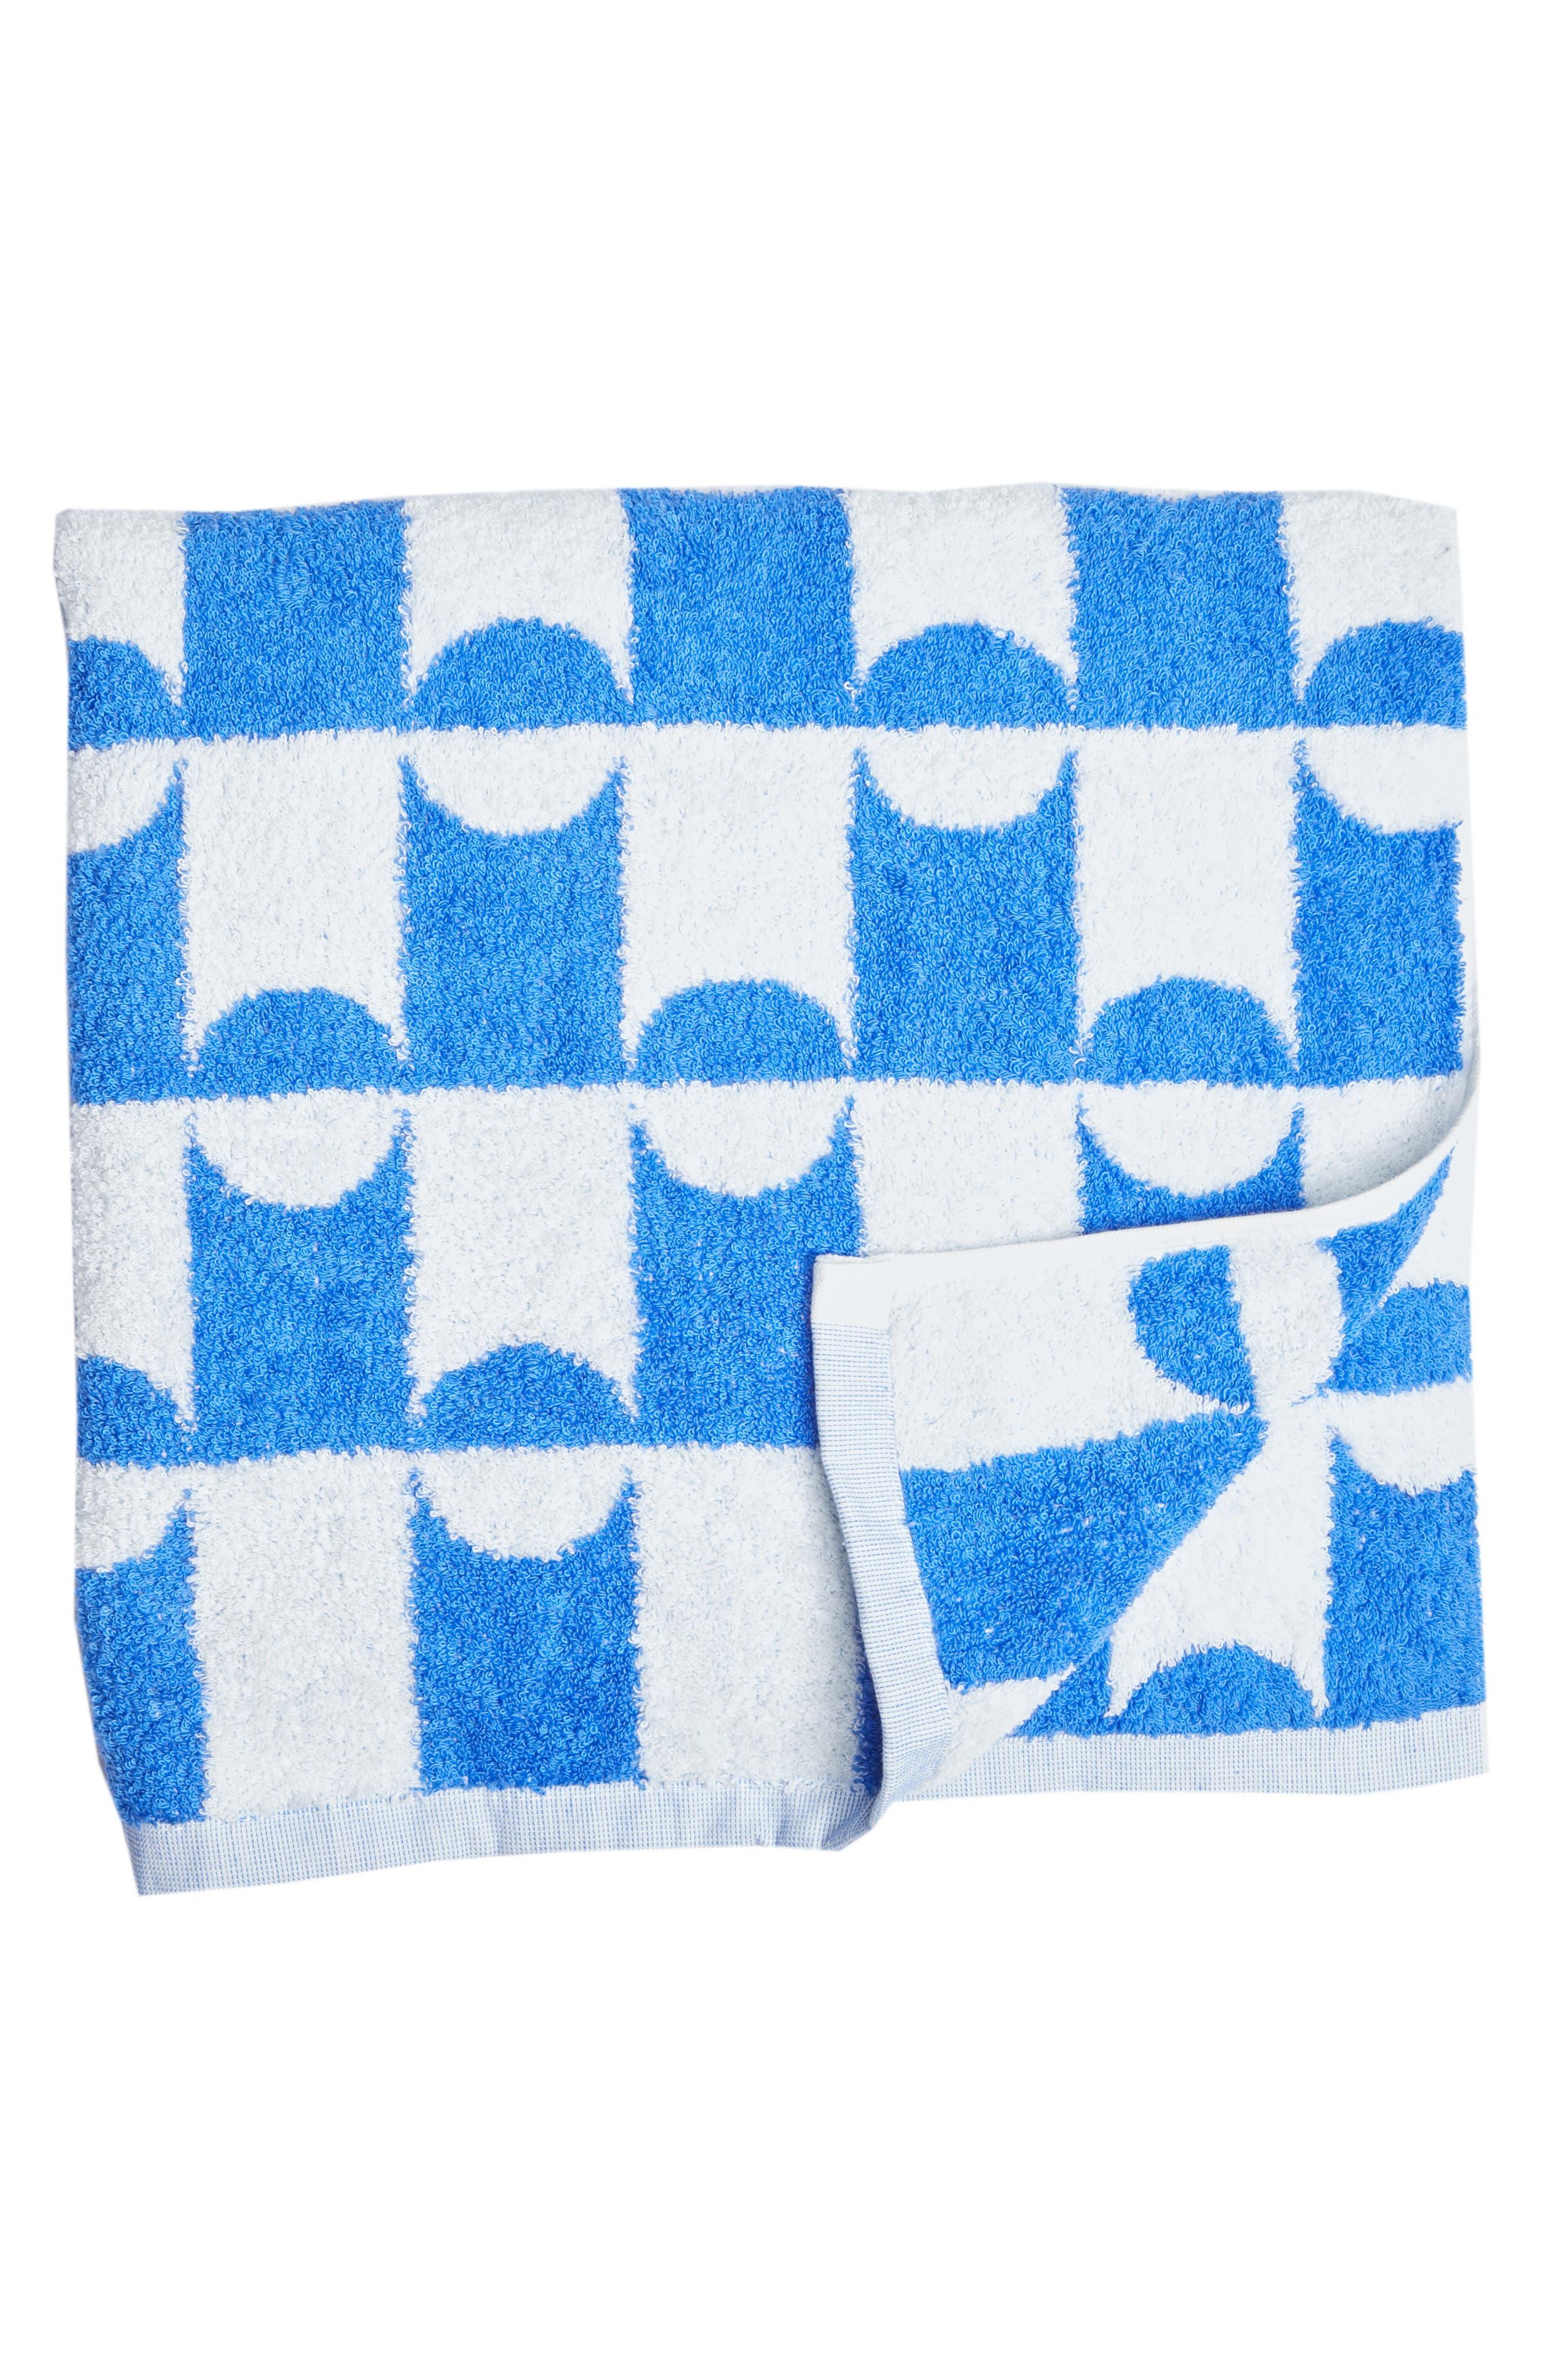 Dusen Dusen Moon Towel